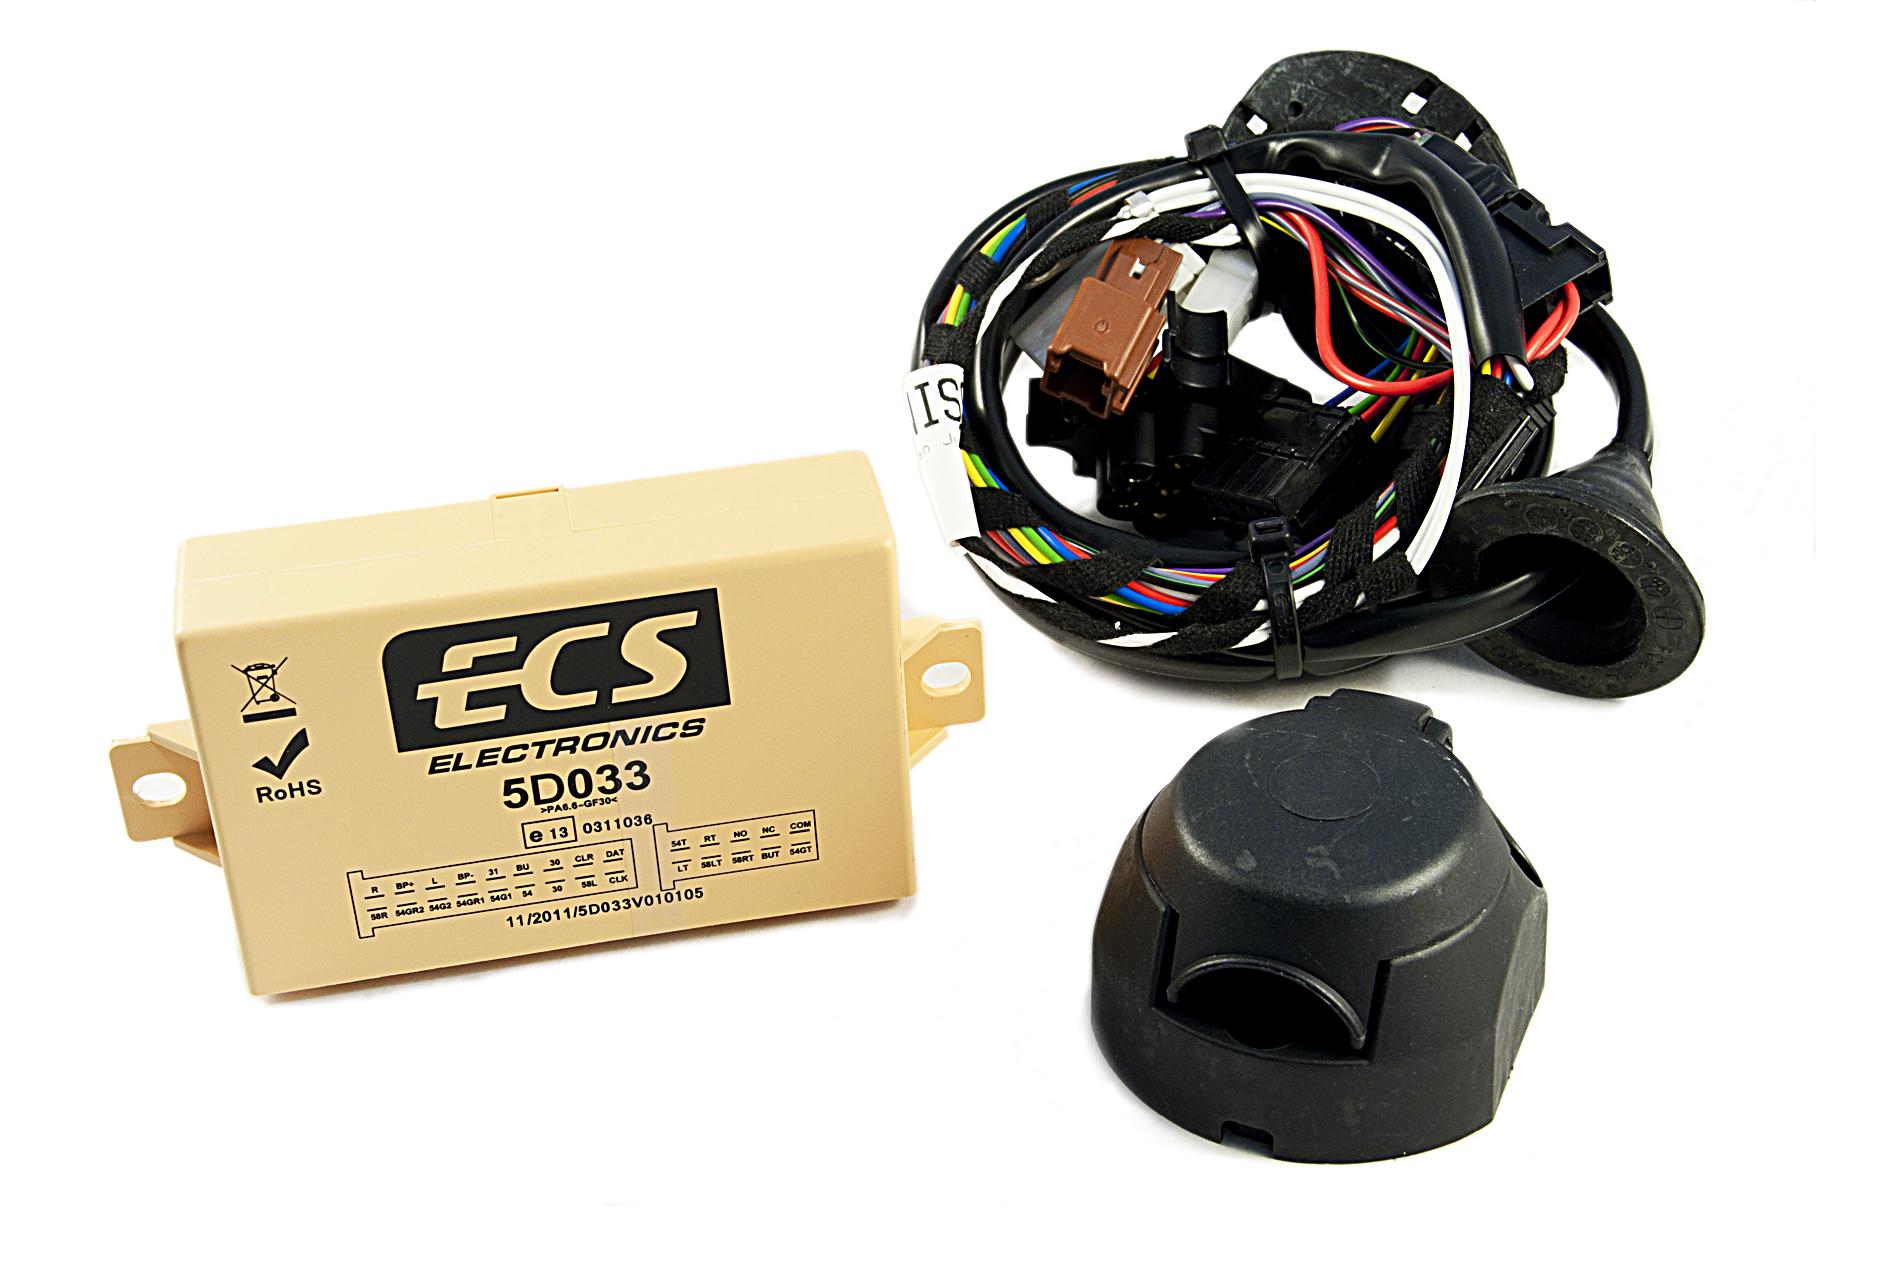 hight resolution of nissan genuine 7 pin towbar hitch trailer towing electric wiring kit ke5051k307 ebay